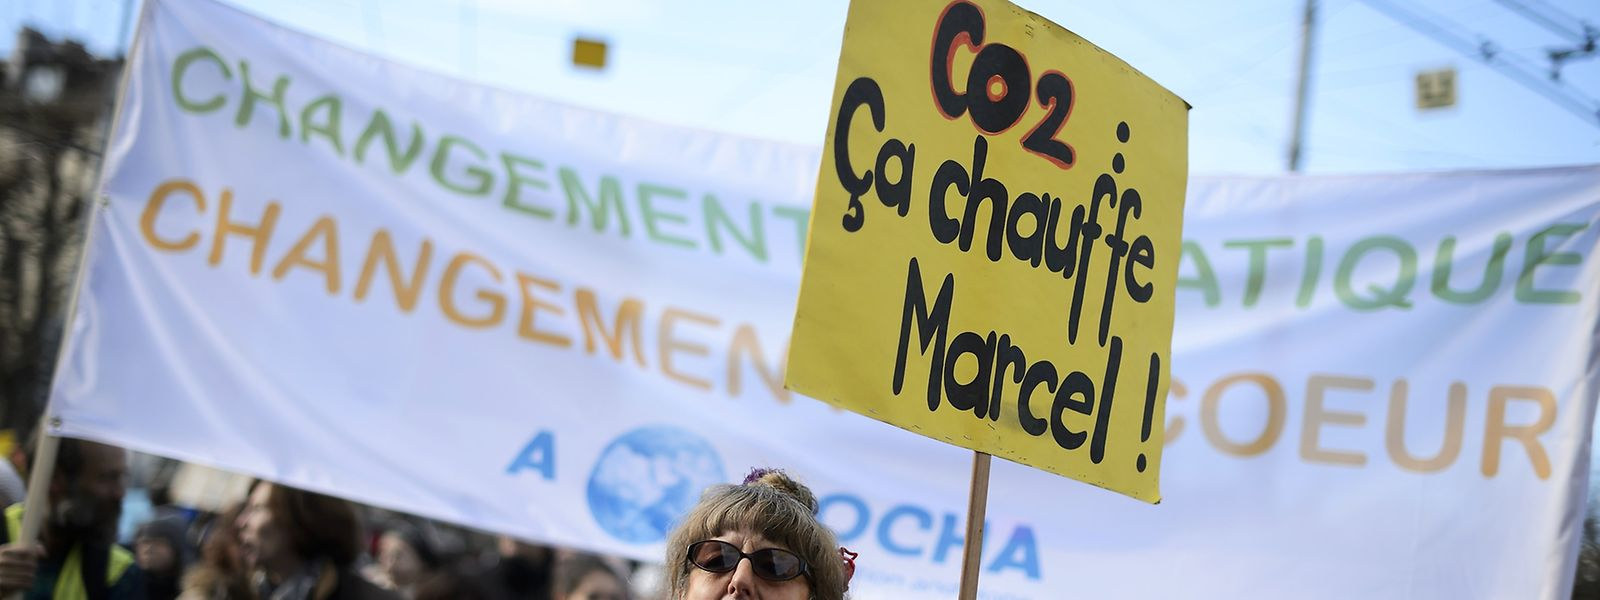 Manifestants à Genève, le samedi 28 novembre 2015